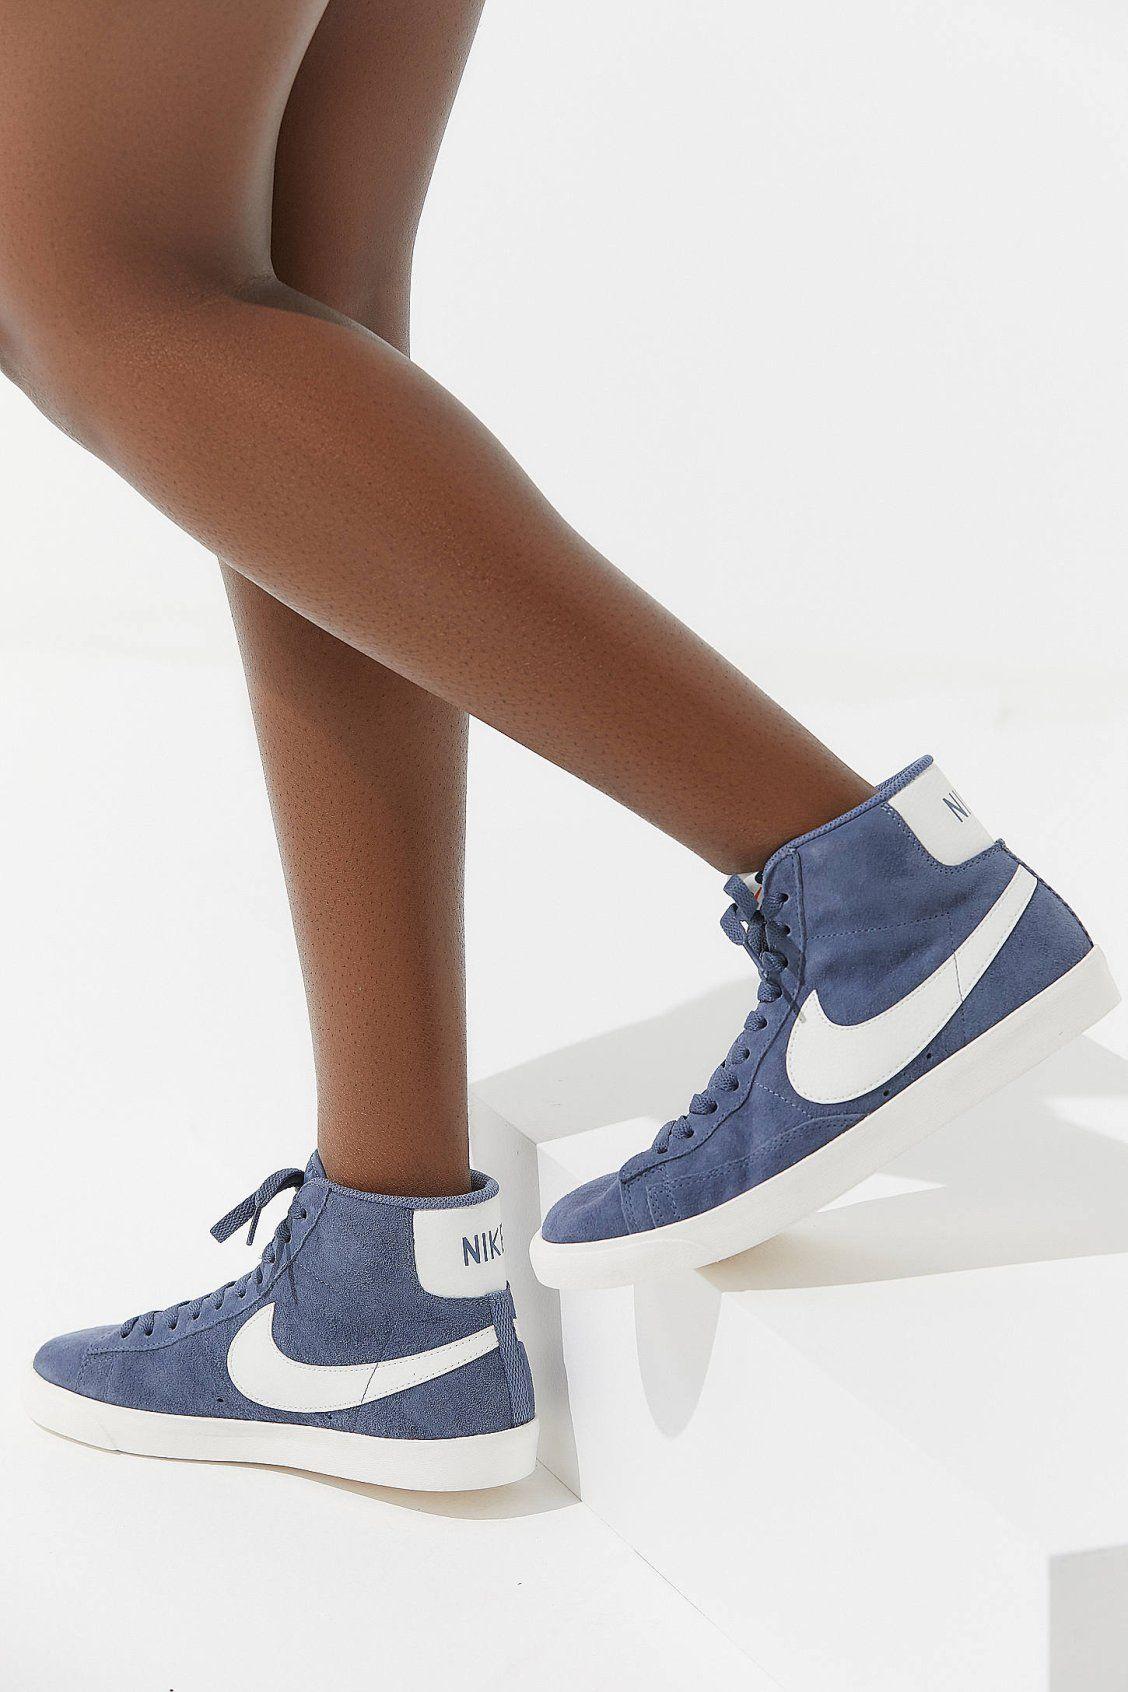 online store 145ec 8d45e Nike Blazer Mid Vintage Sneaker   Urban Outfitters